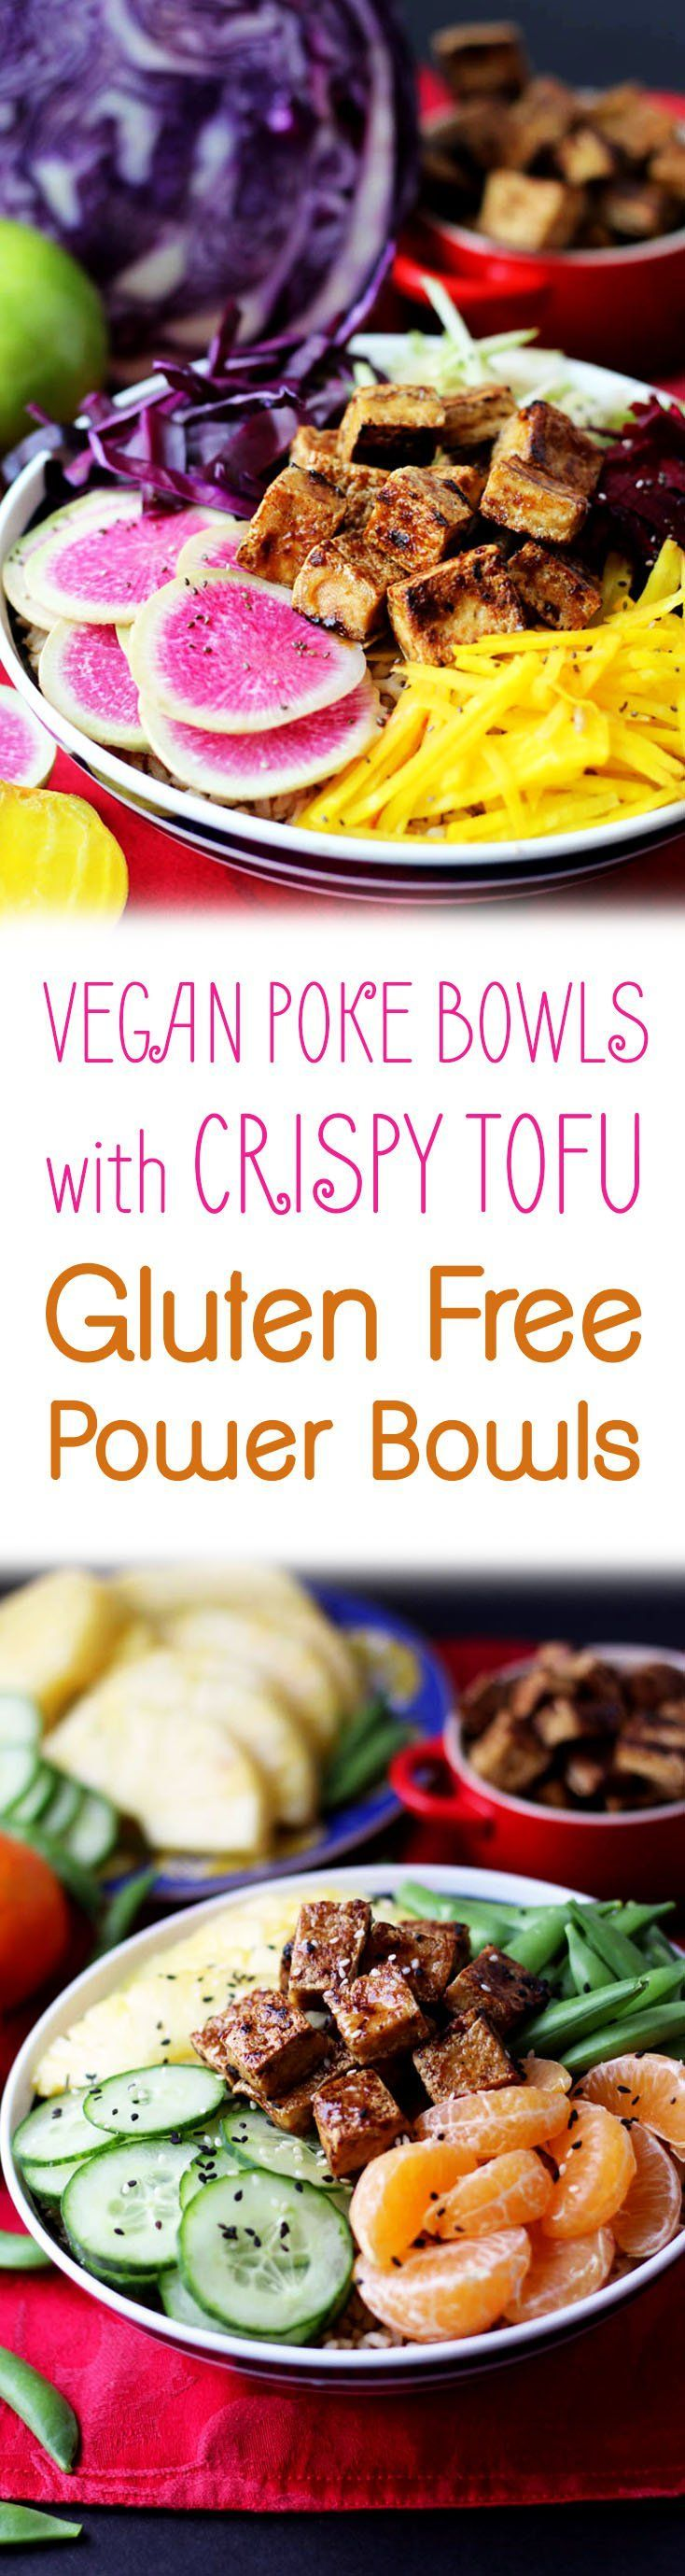 Try my three easy gluten free vegan poke power bowls with crispy tofu. #tofu #vegan #plantbased #pokebowls #poke #glutenfree #healthylunch #lunch #dinner #nourish #healthyfood #healthyeating #balanced #wholefoods